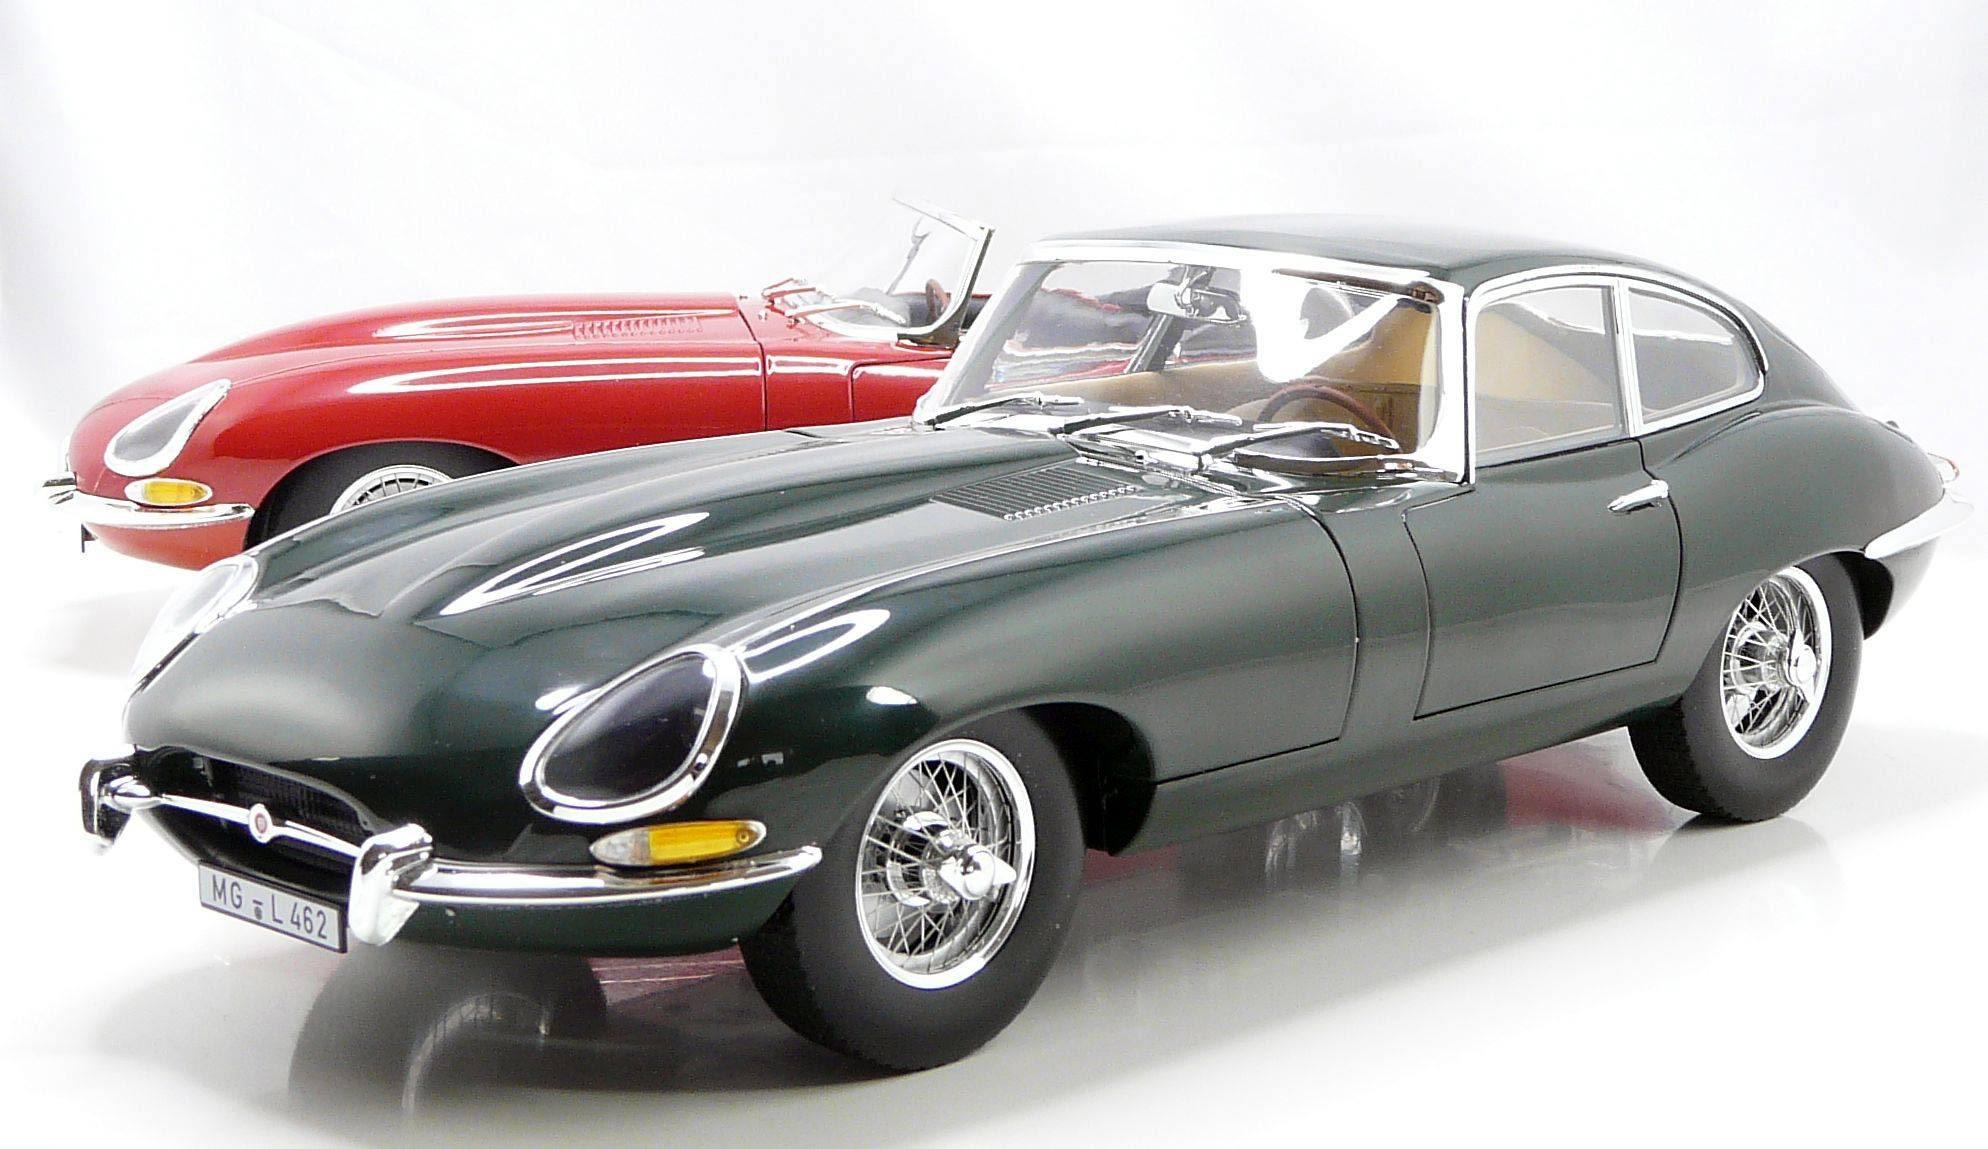 Jaguar Type E Norev 1/12